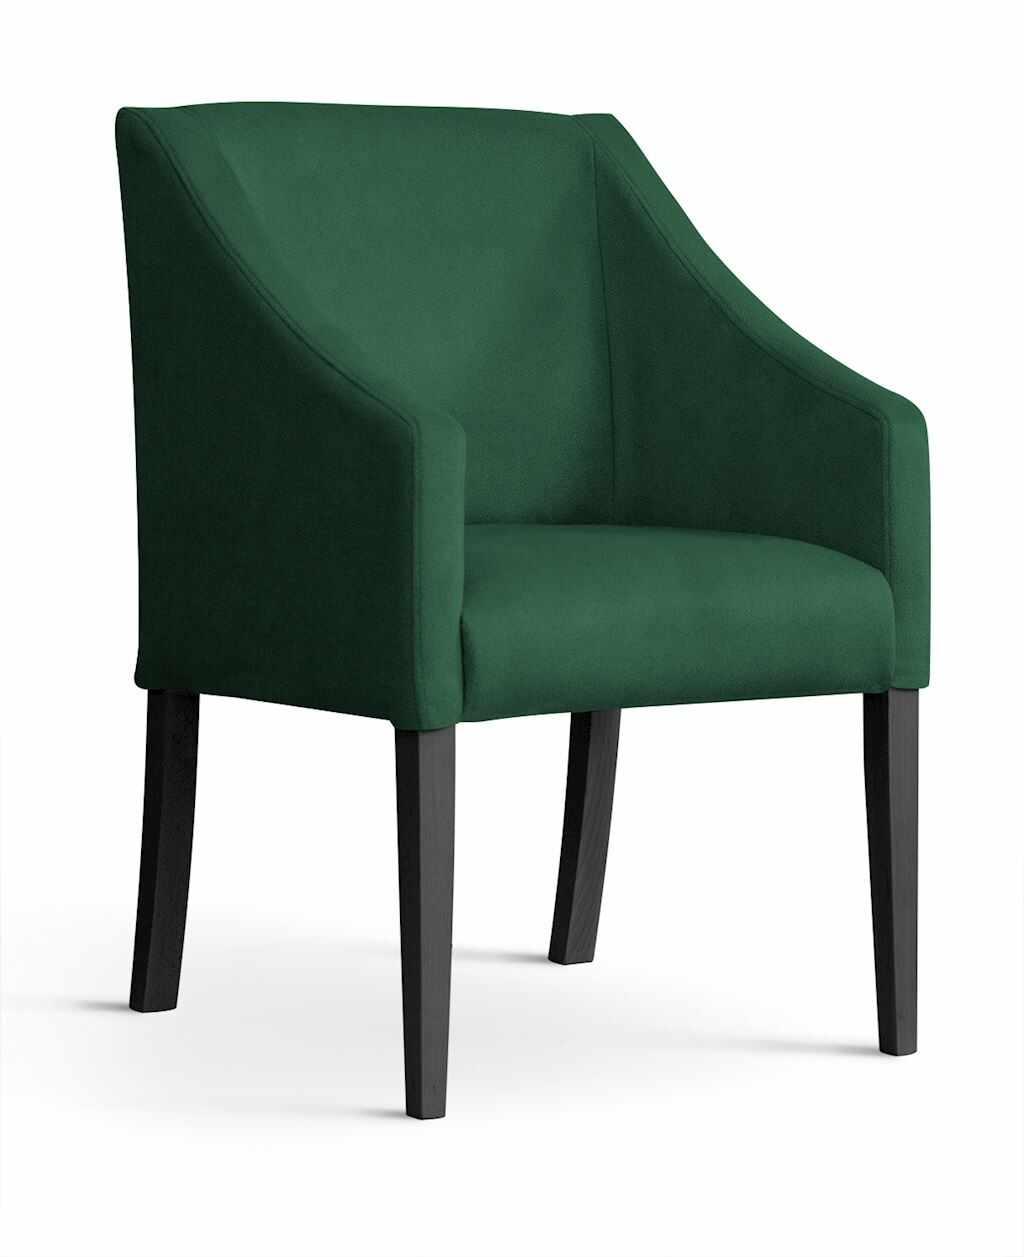 Fotoliu fix tapitat cu stofa si picioare din lemn Capri Velvet Verde / Negru, l58xA60xH89 cm la pret 902 lei